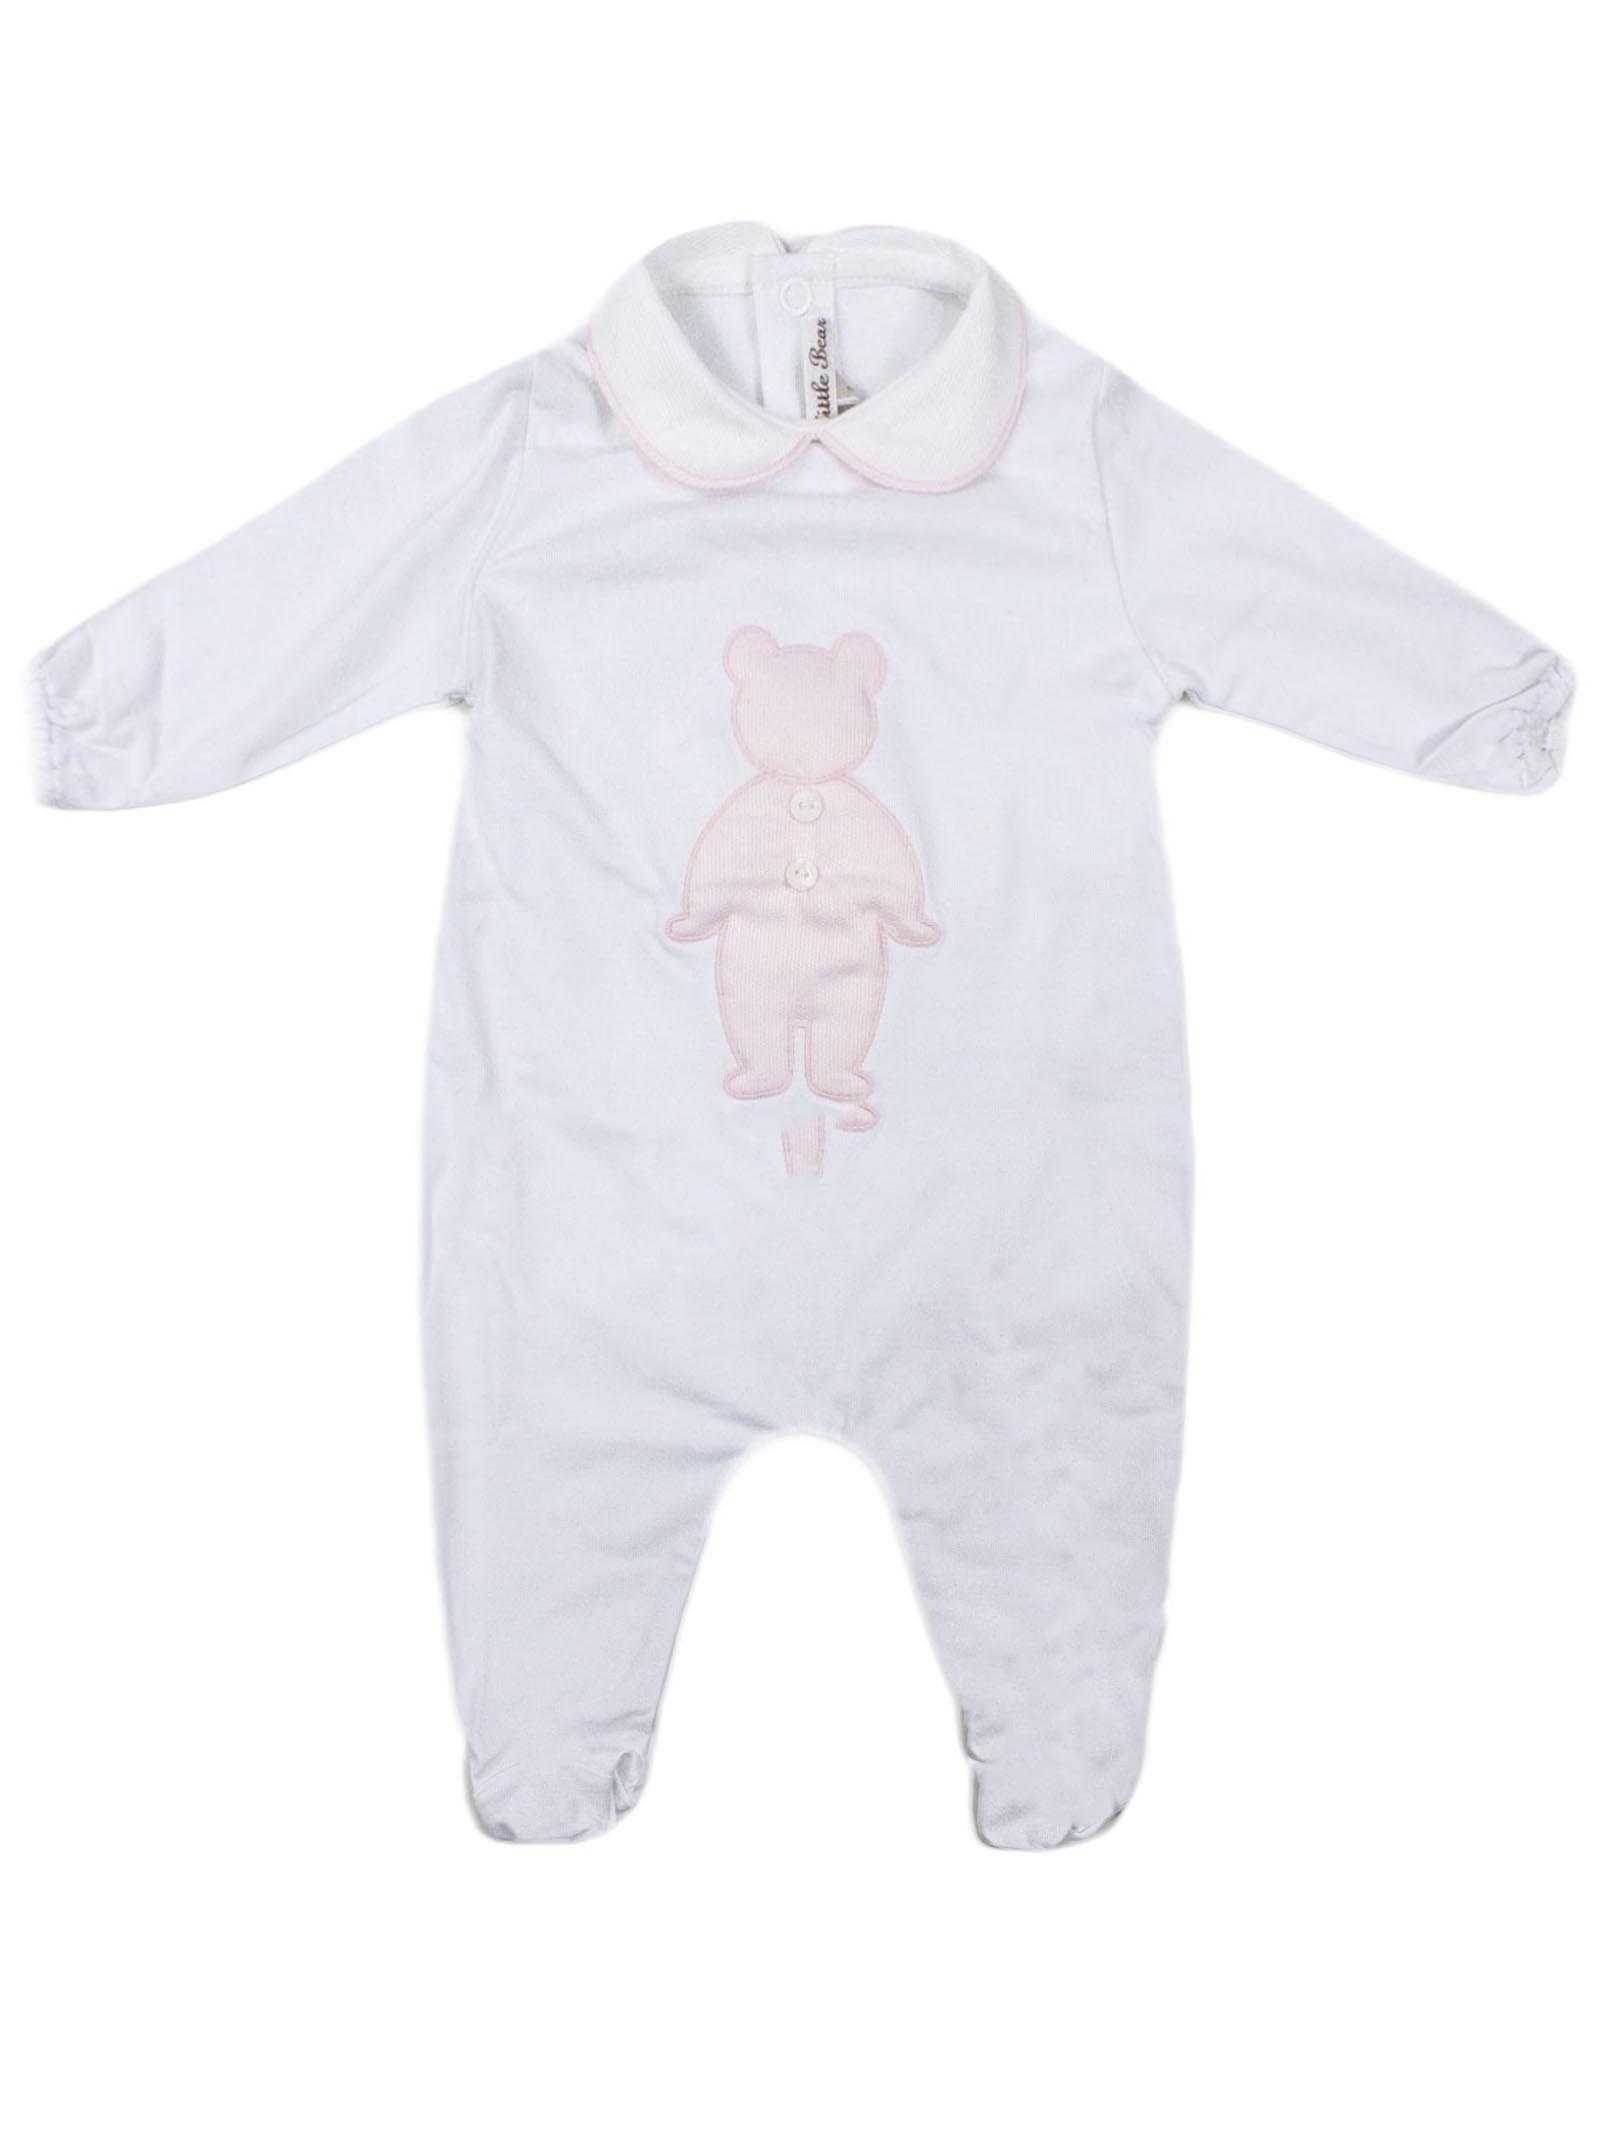 LITTLE BEAR | 517 | 9156BBCOROSA